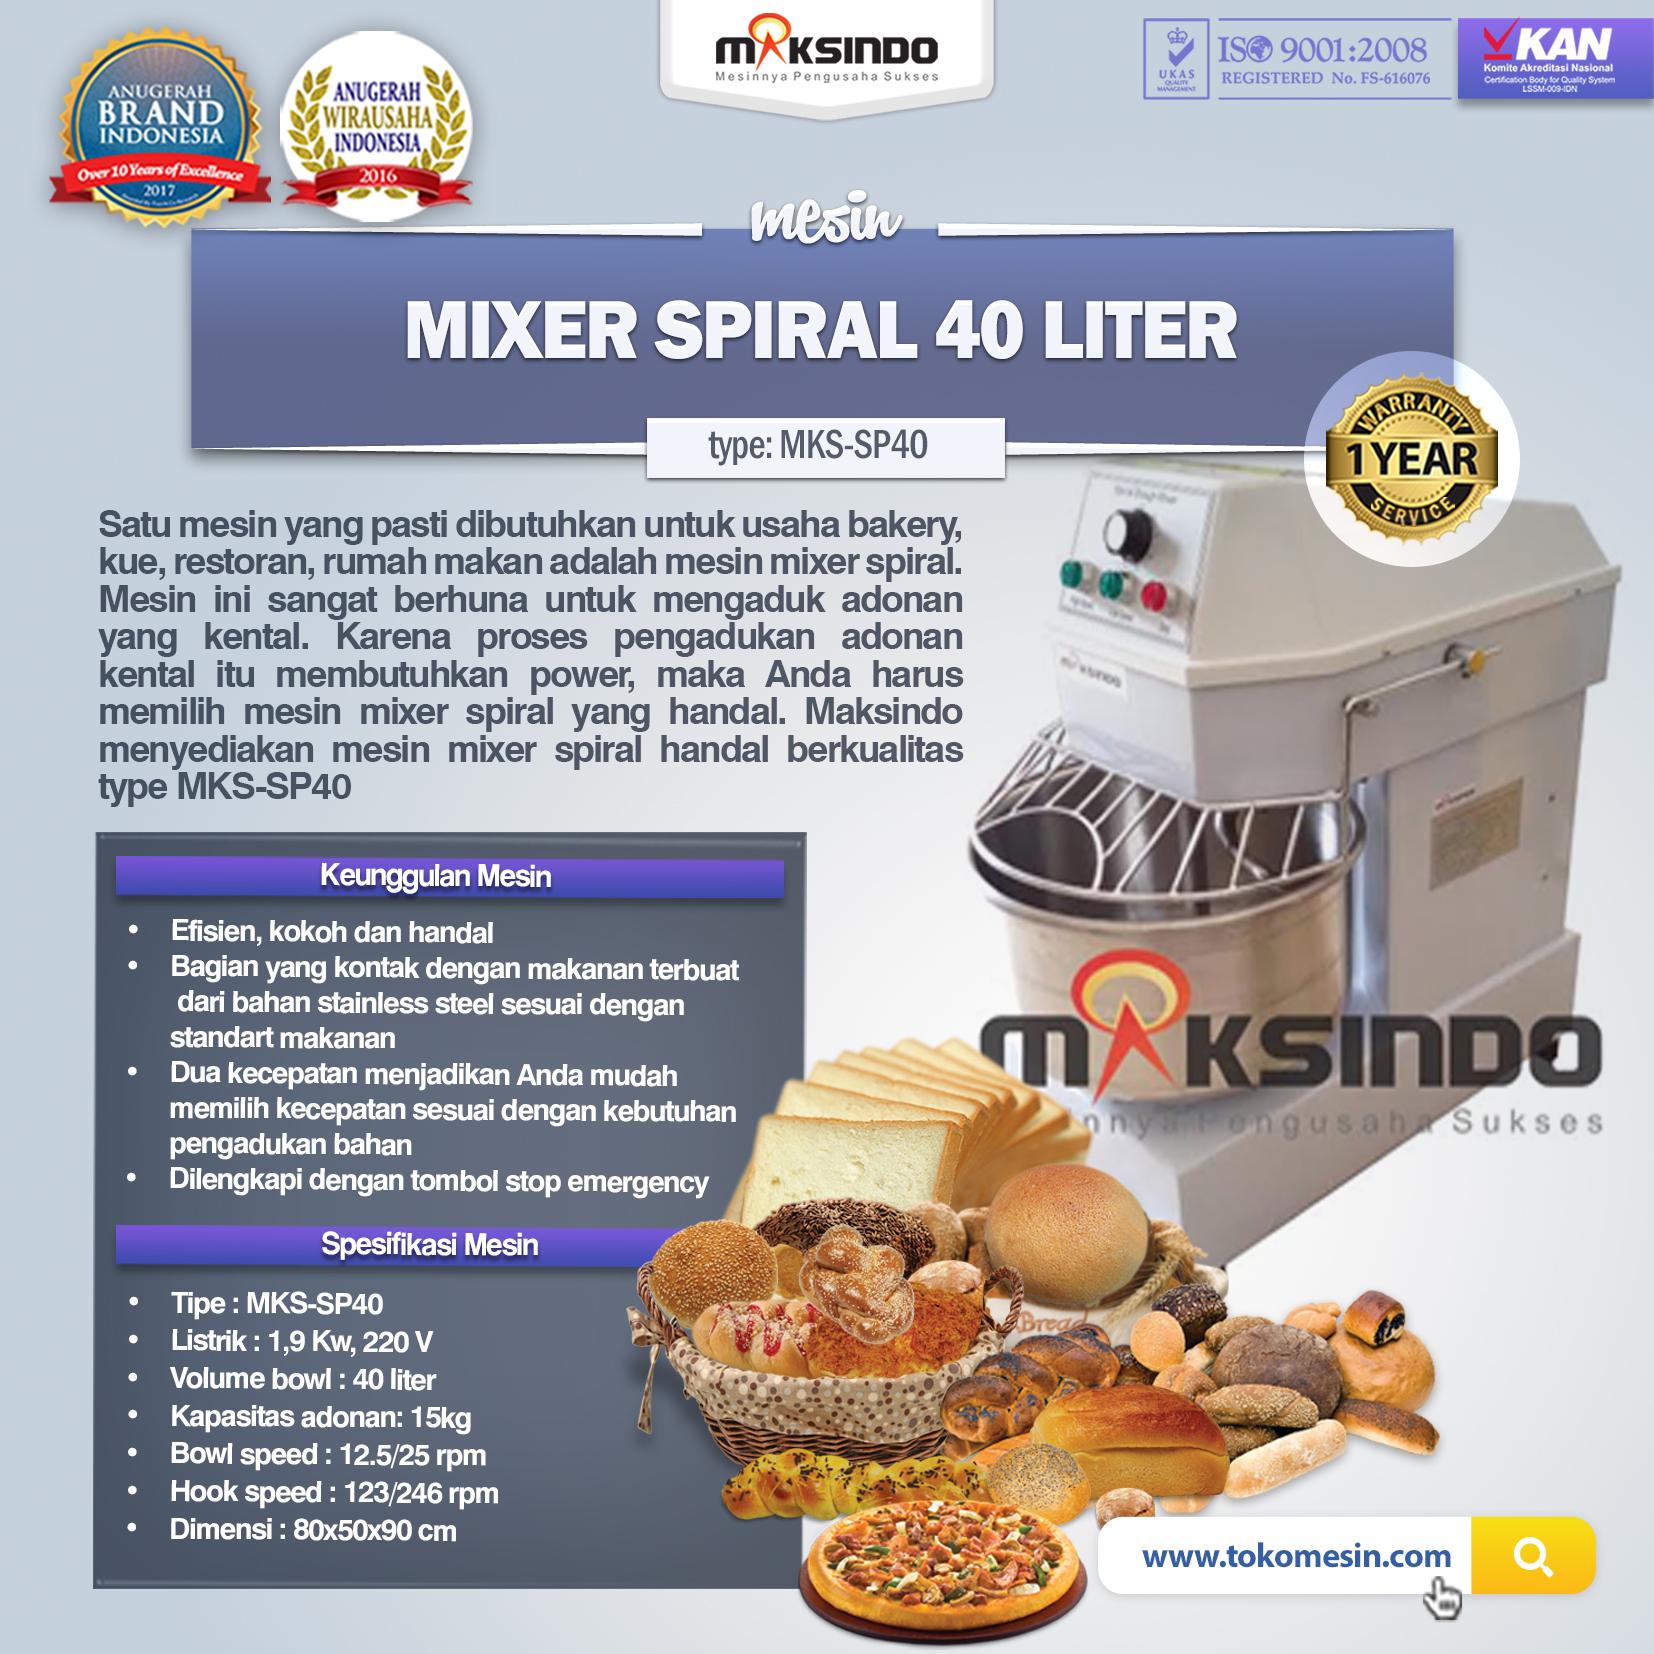 Mixer Spiral 40 Liter (MKS-SP40)(1)